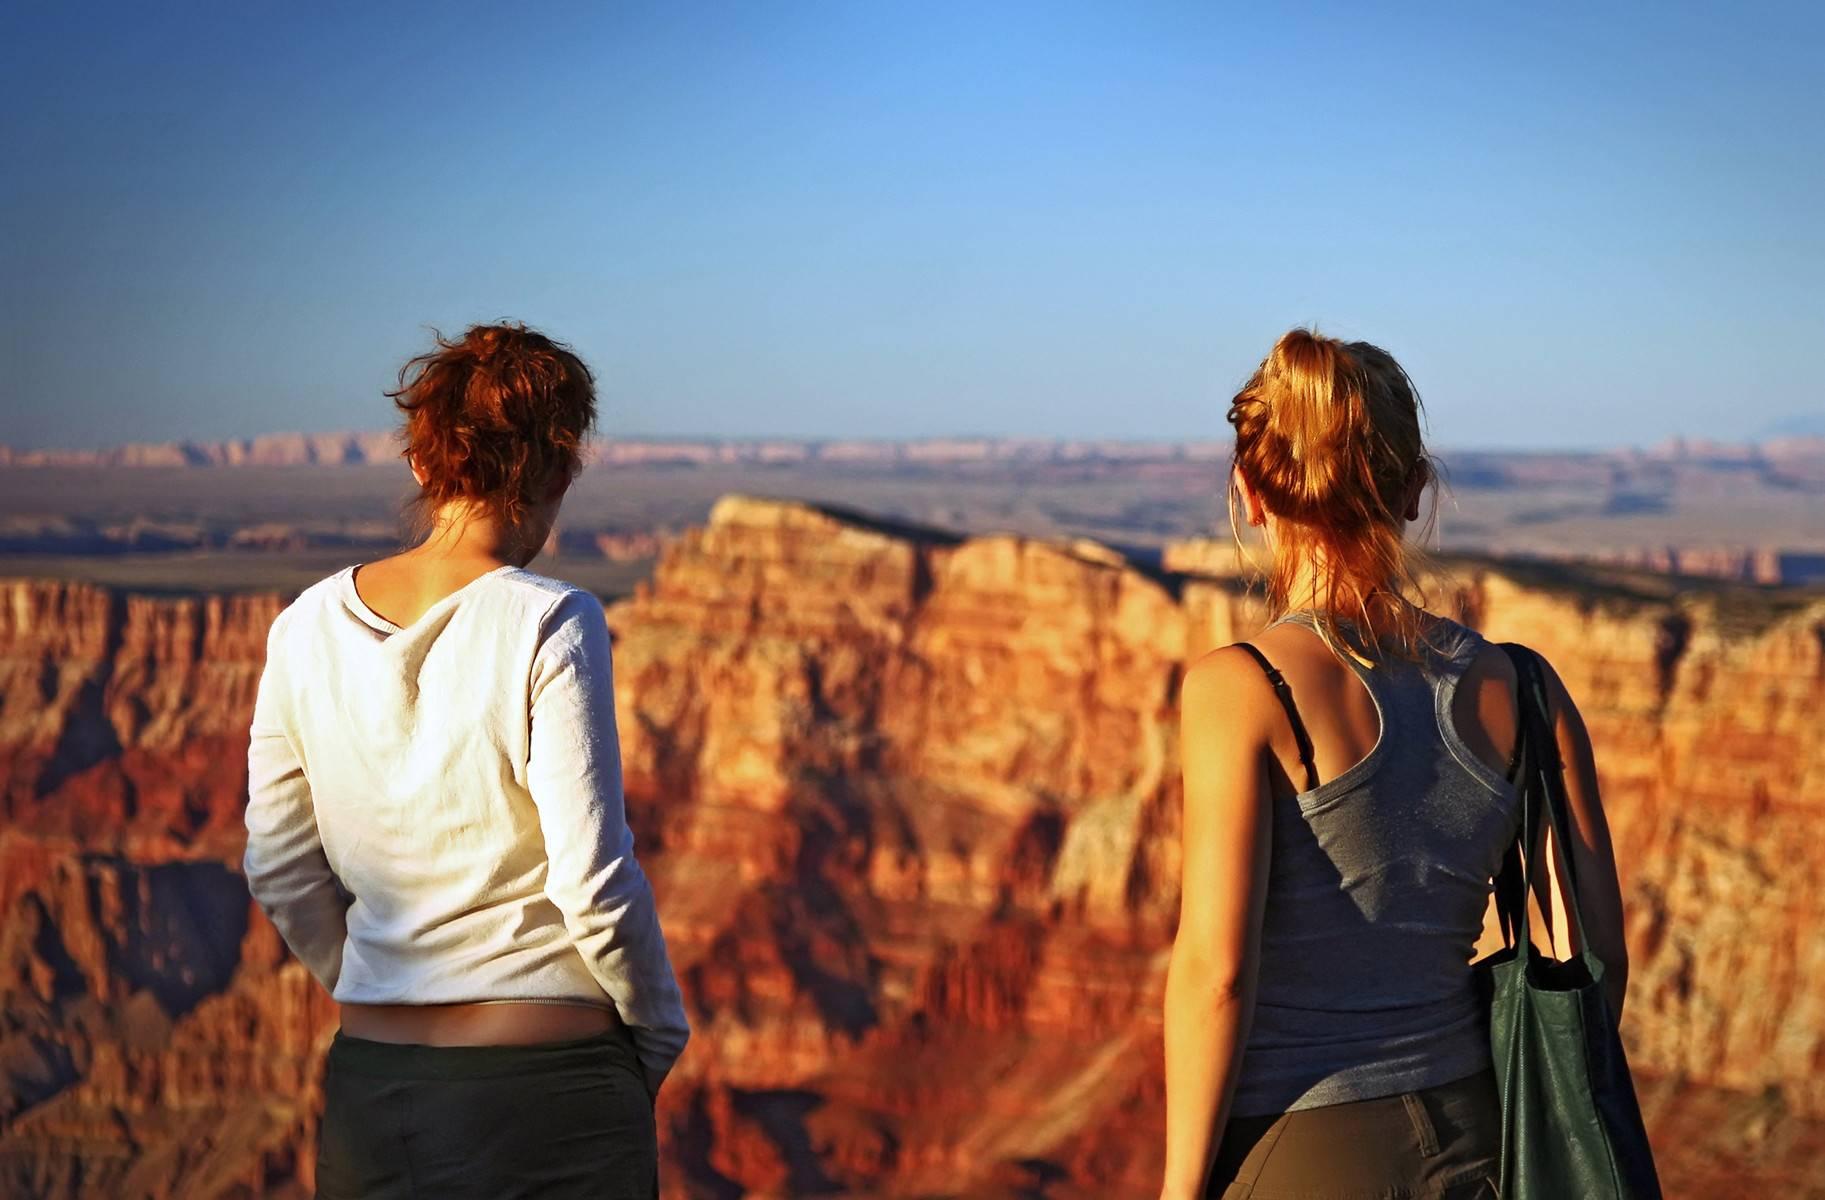 Grand Canyon Tour From Las Vegas Tours4fun